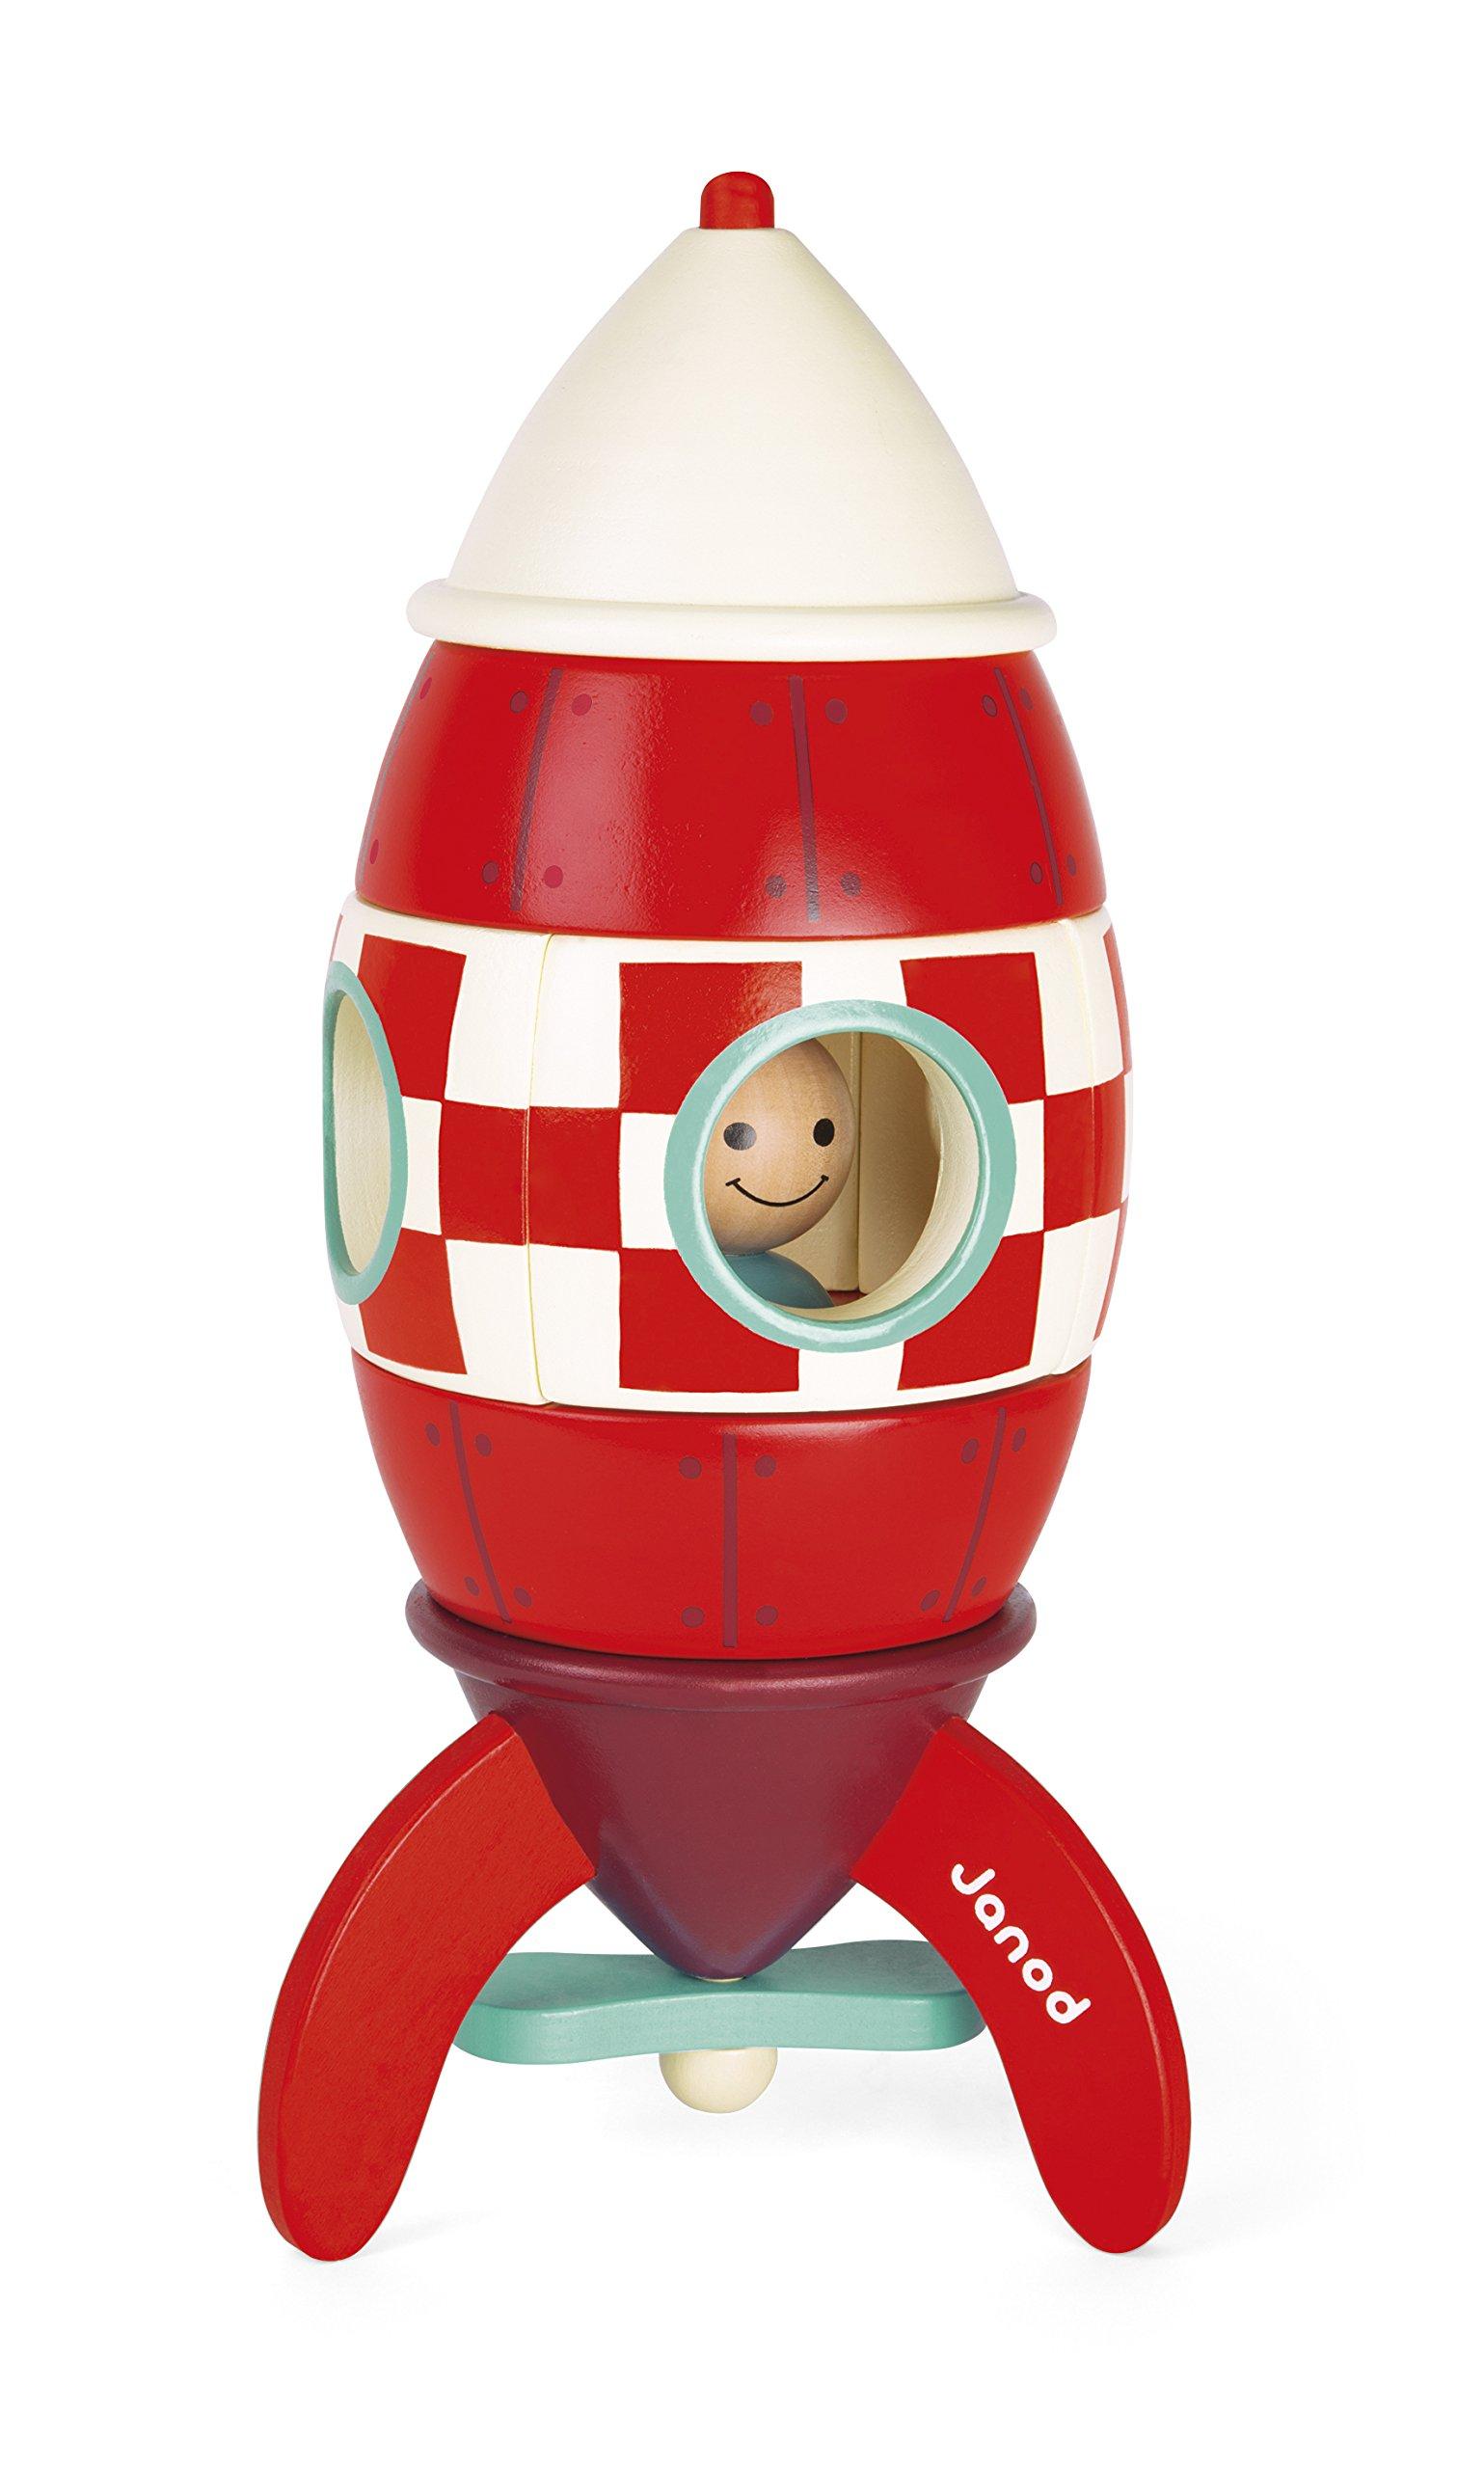 Janod J05212 Wooden Magnetic Rocket, Large (32 cm)